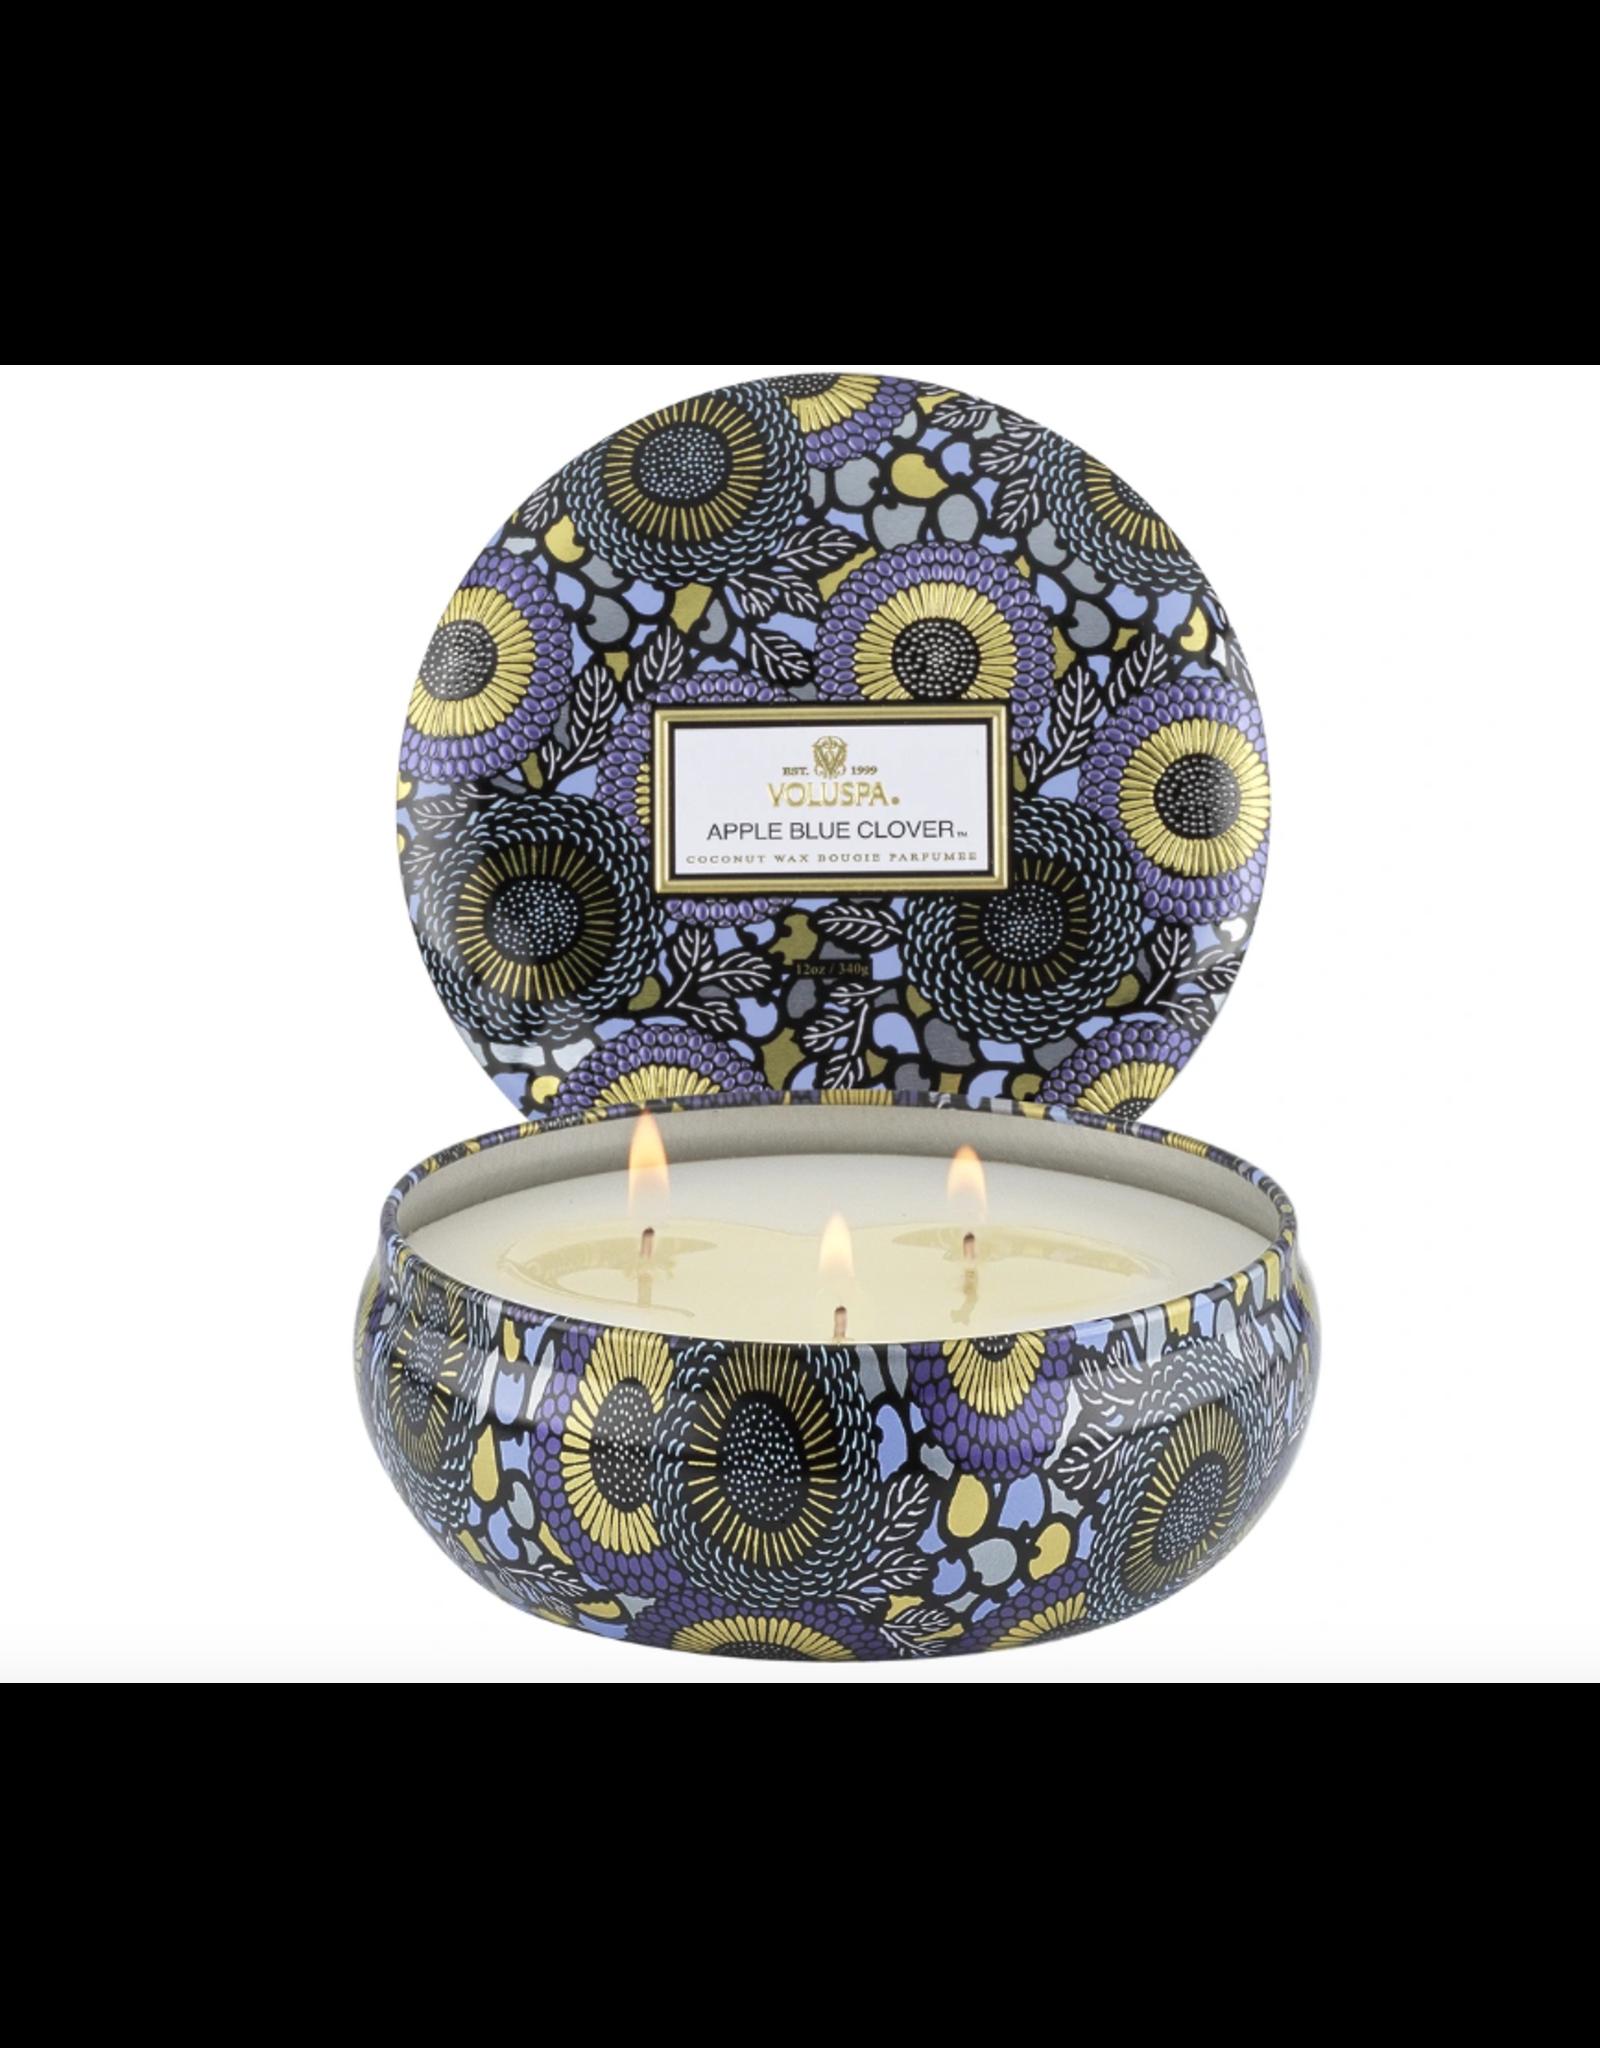 Voluspa Apple Blue Clover 3 Wick Candle in Decorative Tin